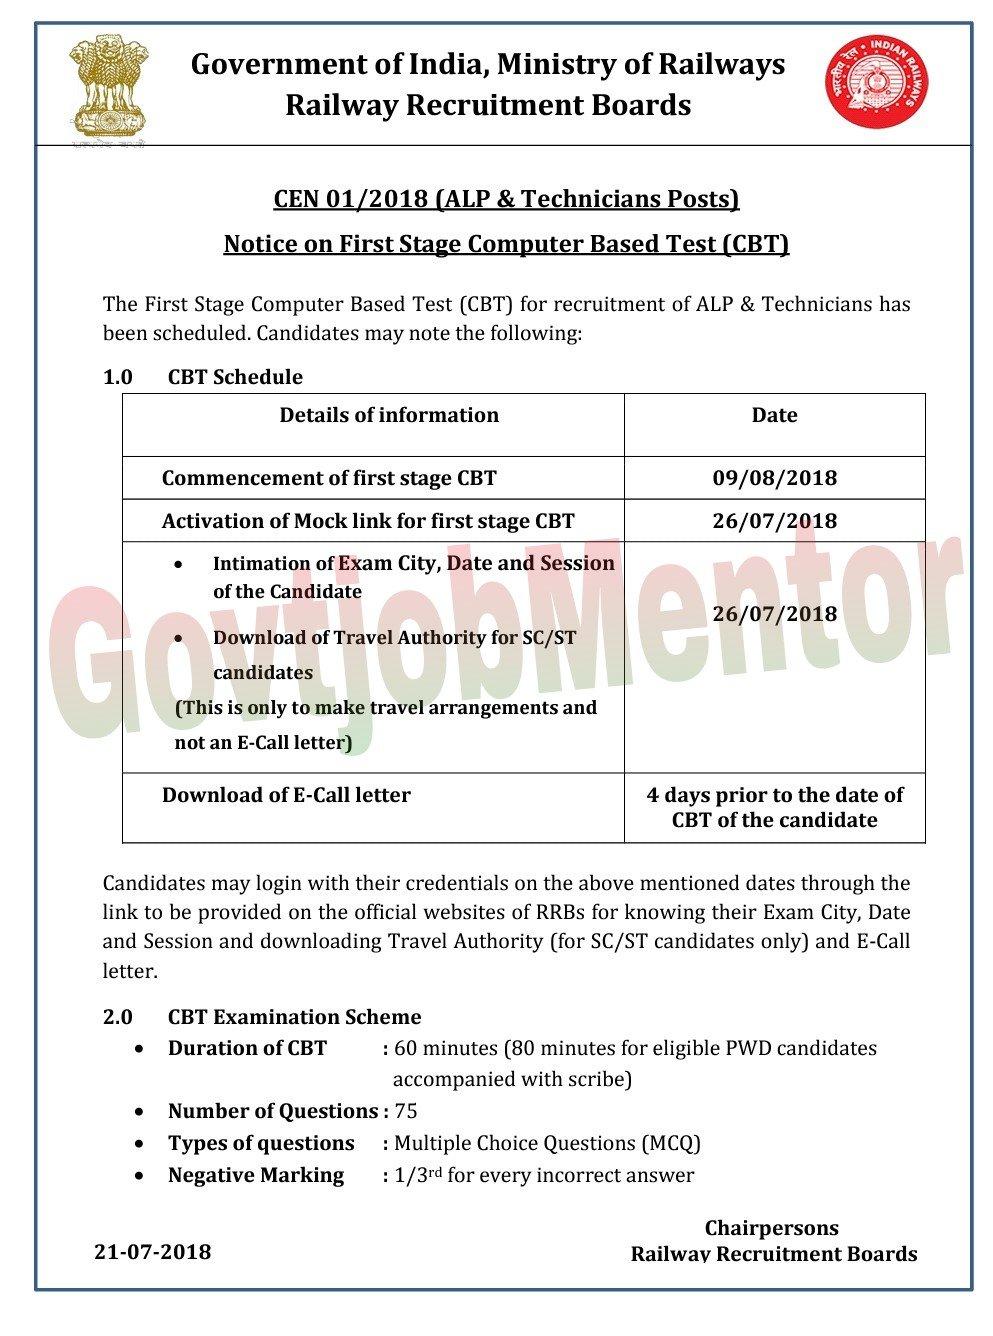 ALP & Technician Exam Date scheduled : RRB Notice